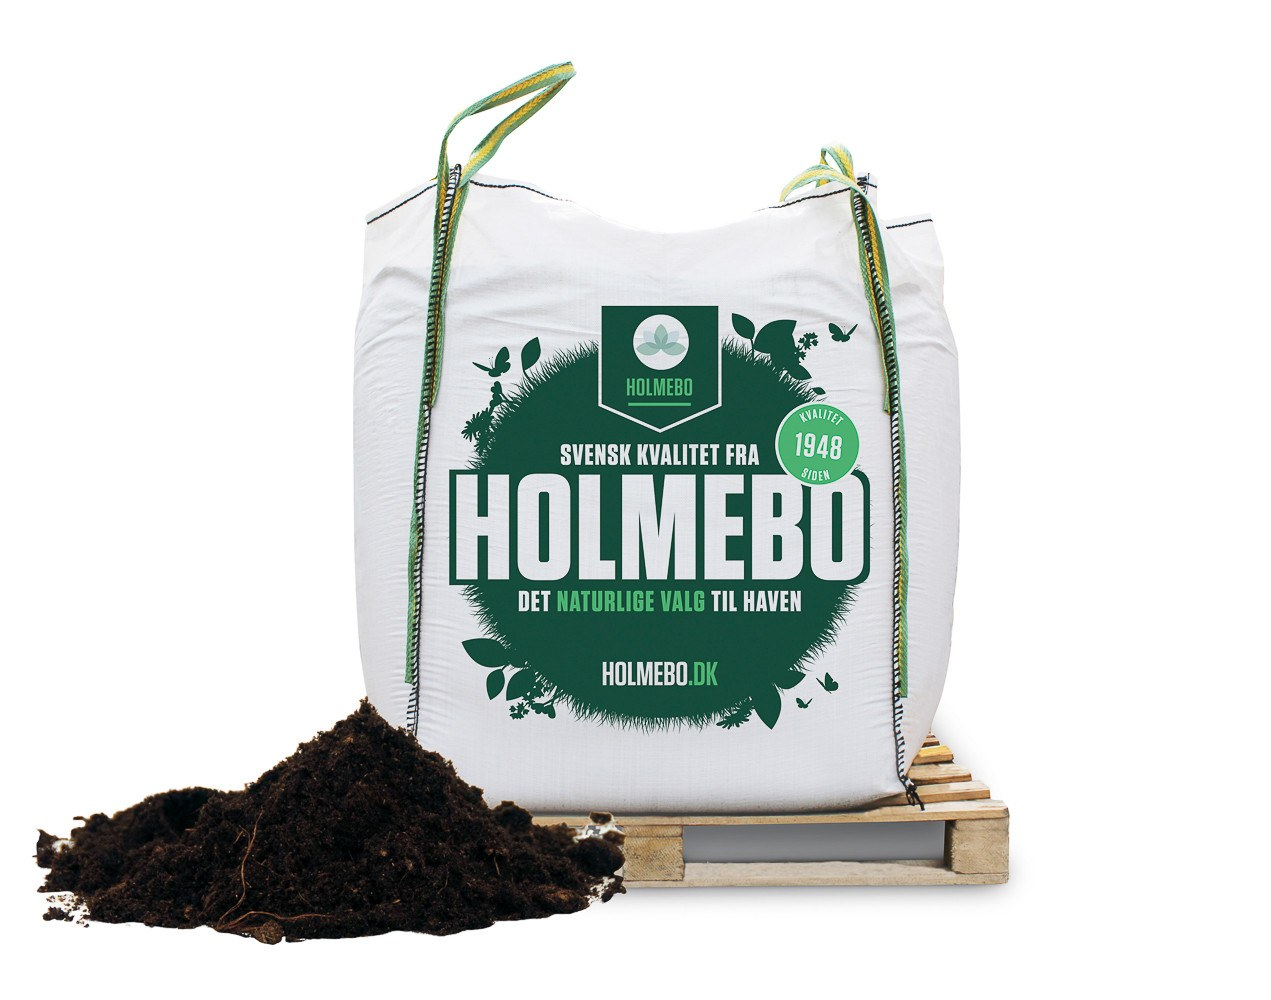 Holmebo Højbedsmuld - Bigbag á 1000 liter